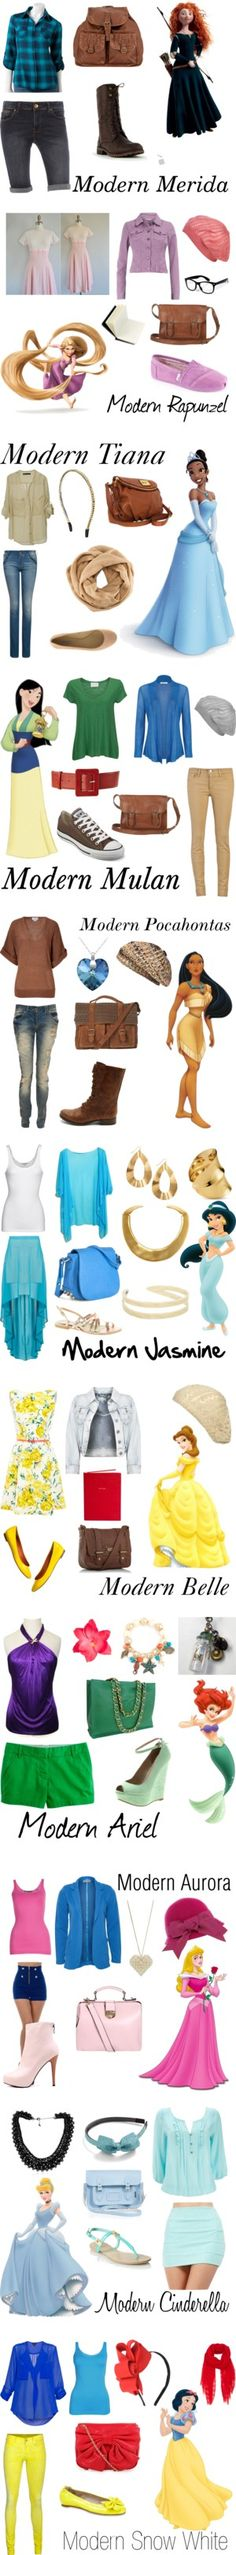 """Modern Disney Princesses"" by sharkbitegal on Polyvore"